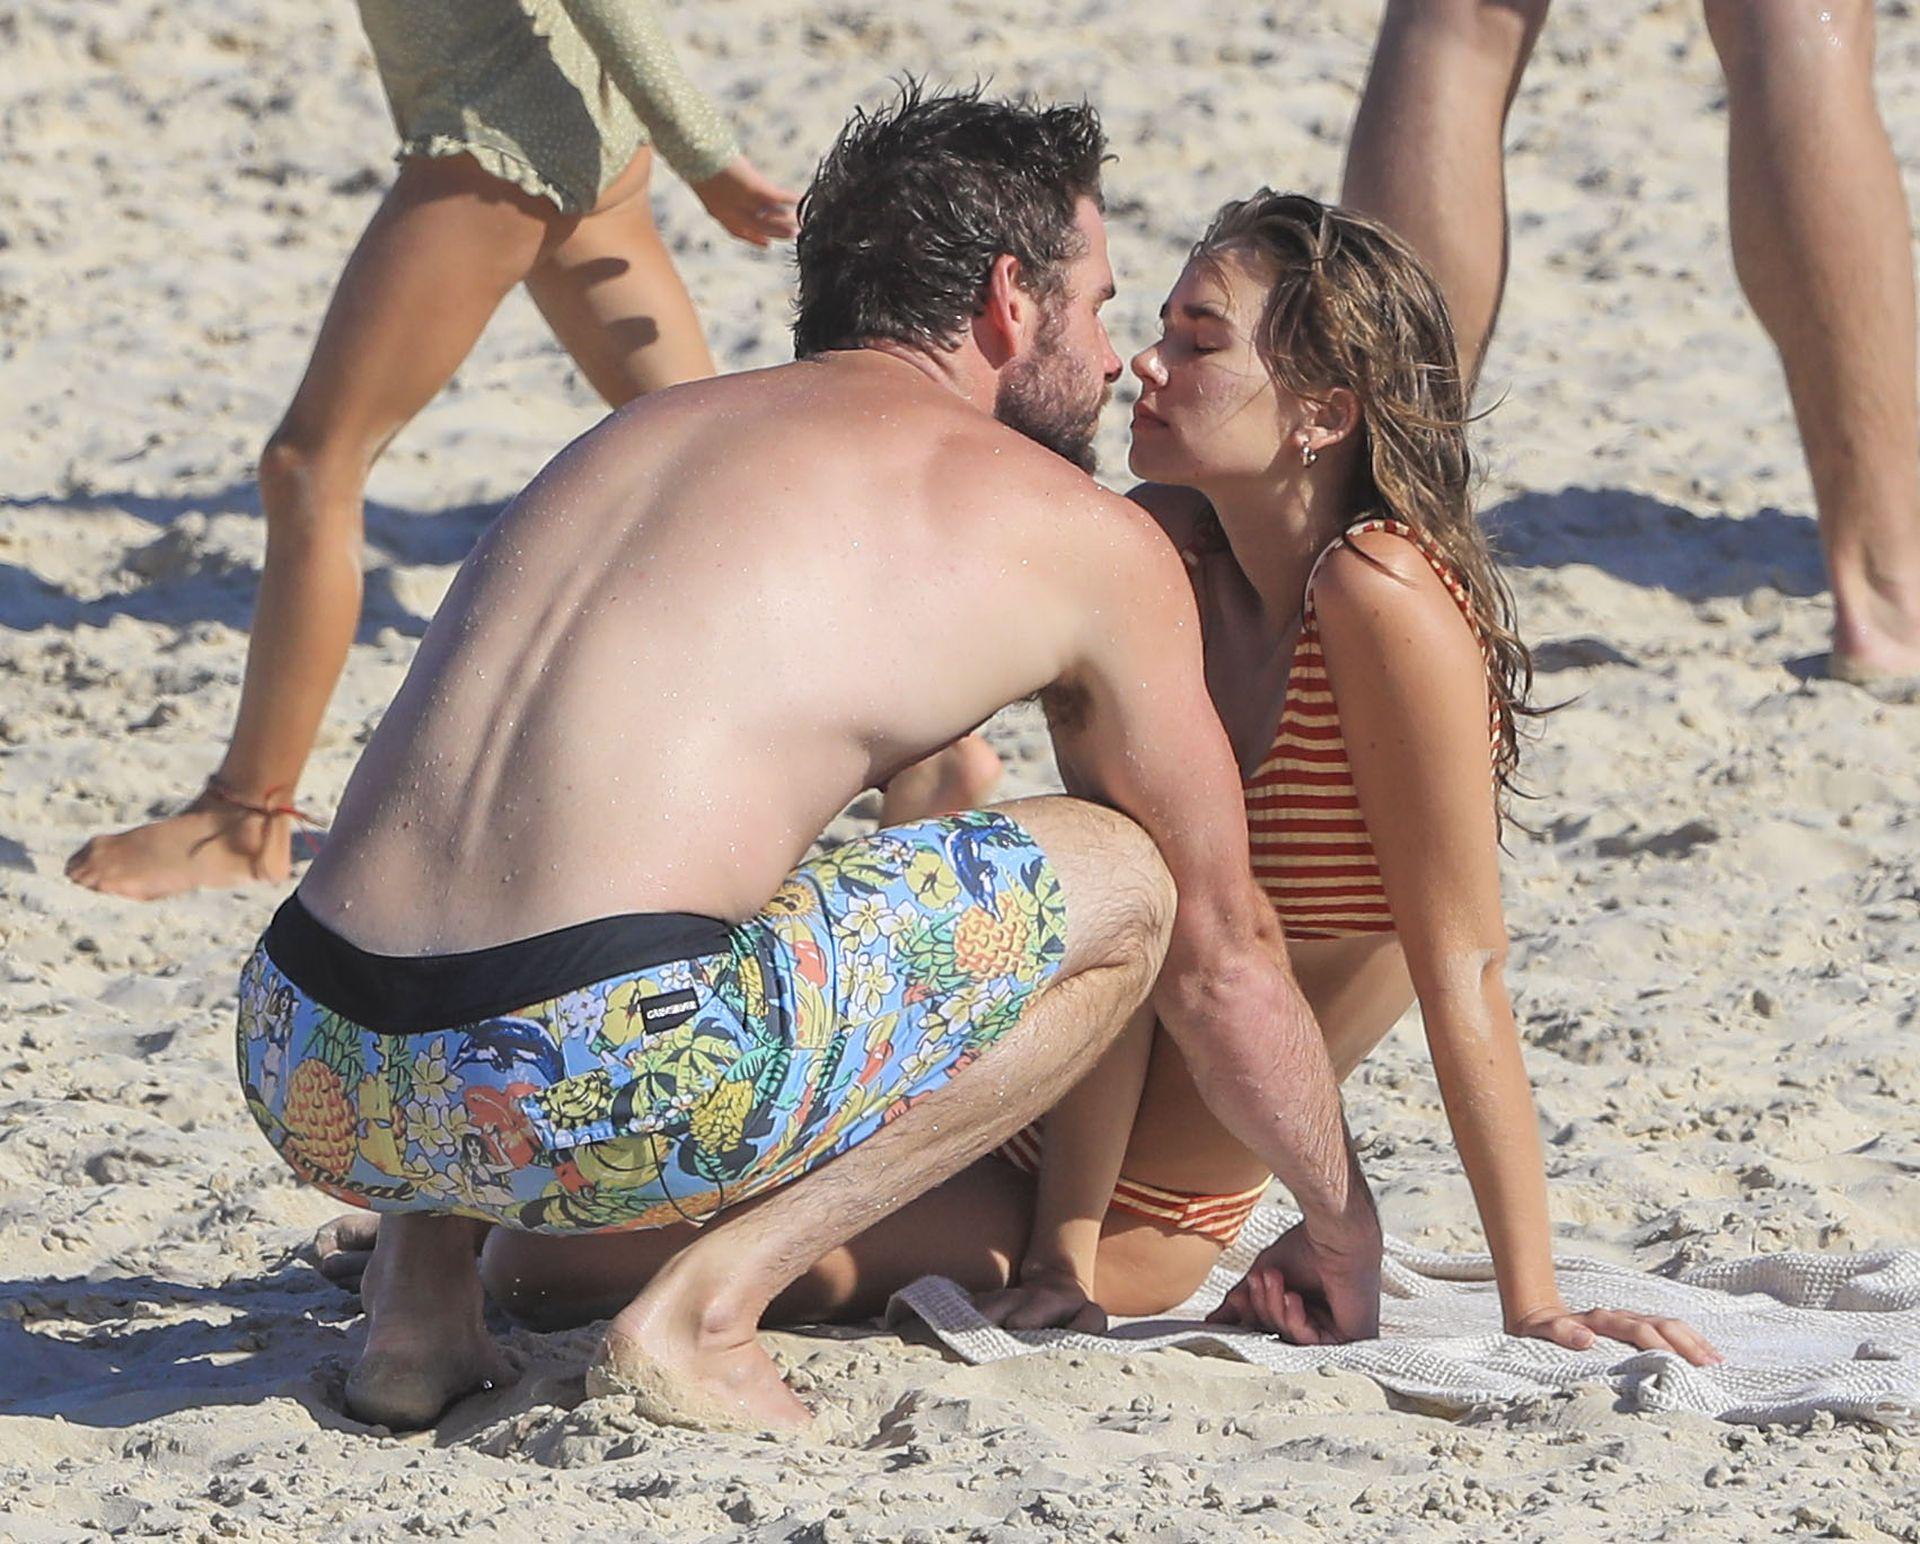 Gabriella Brooks Hot – Liam Hemsworth's New Girlfriend 0011